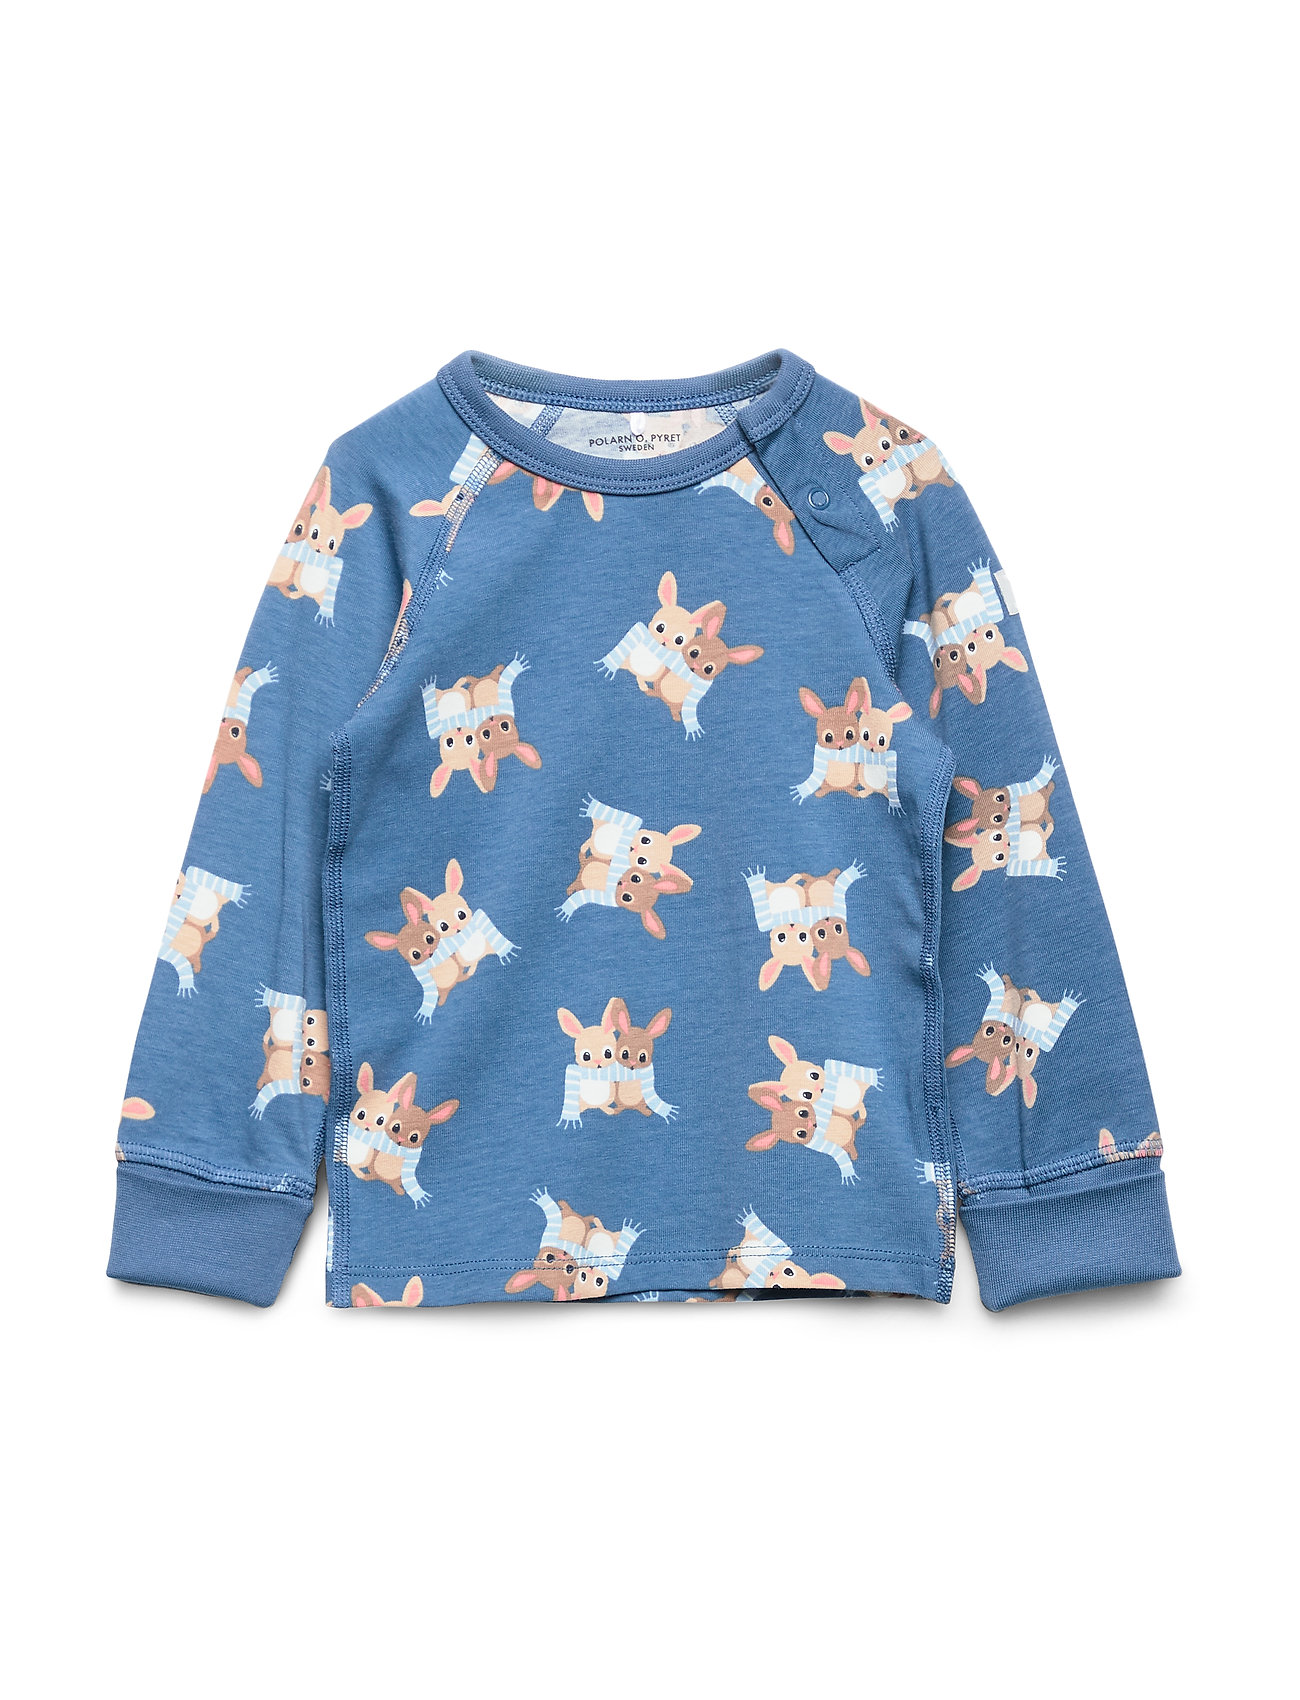 Polarn O. Pyret TOP L/S AOP Baby - DARK BLUE